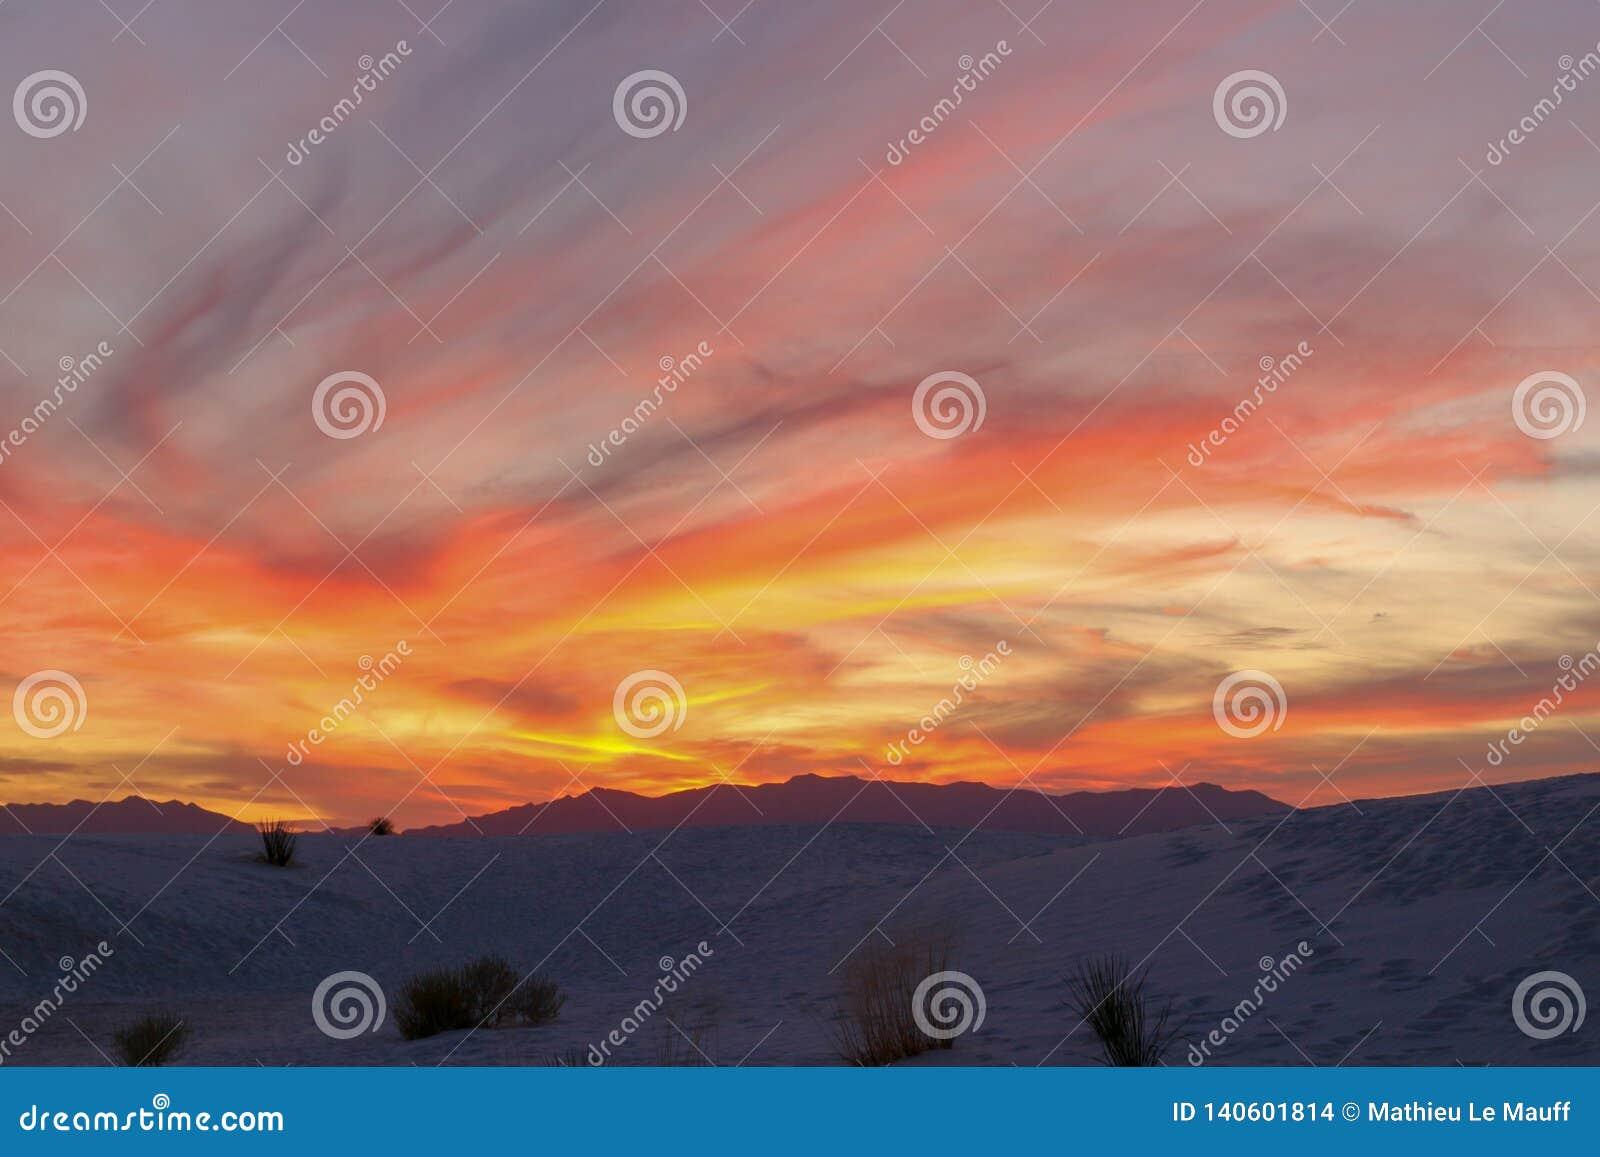 Zonsondergang in Witte Zandwoestijn